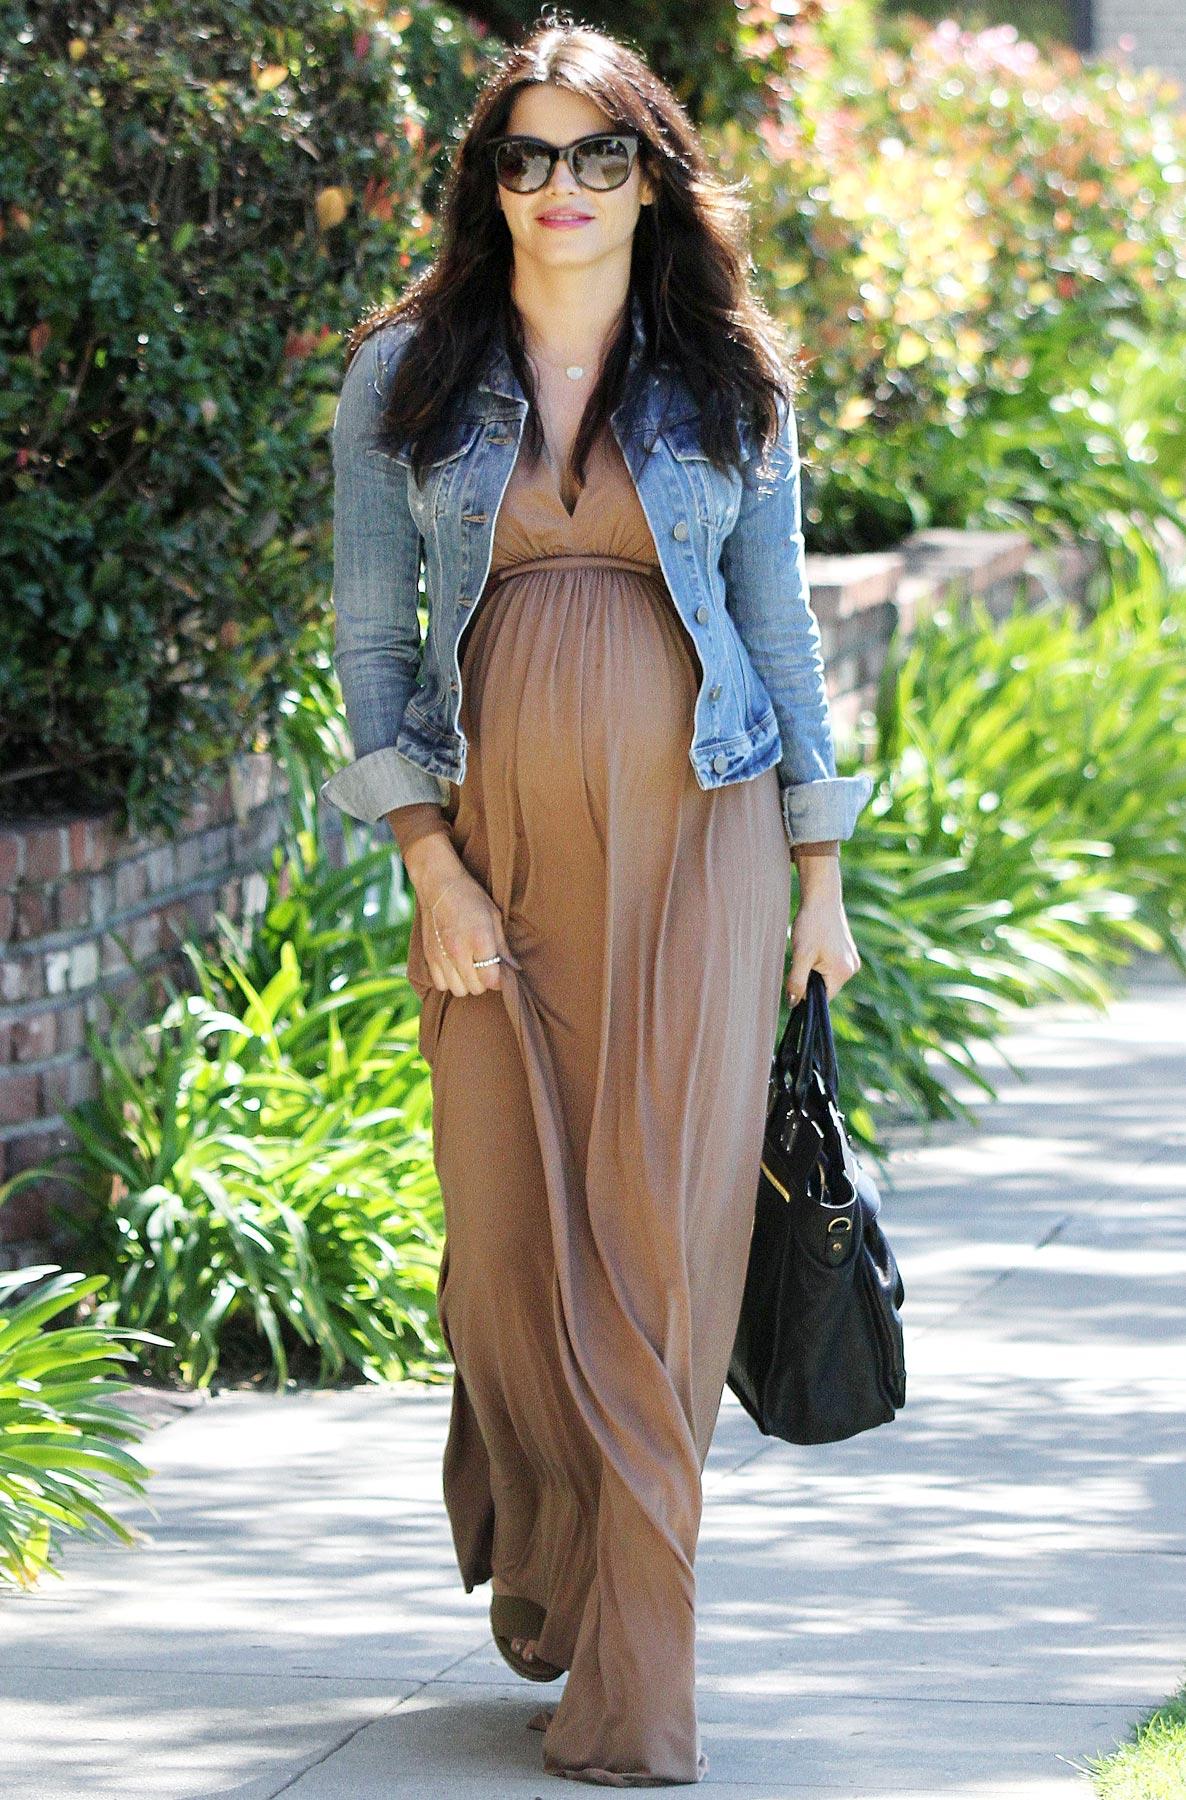 Jenna Dewan-Tatum's Maternity Style